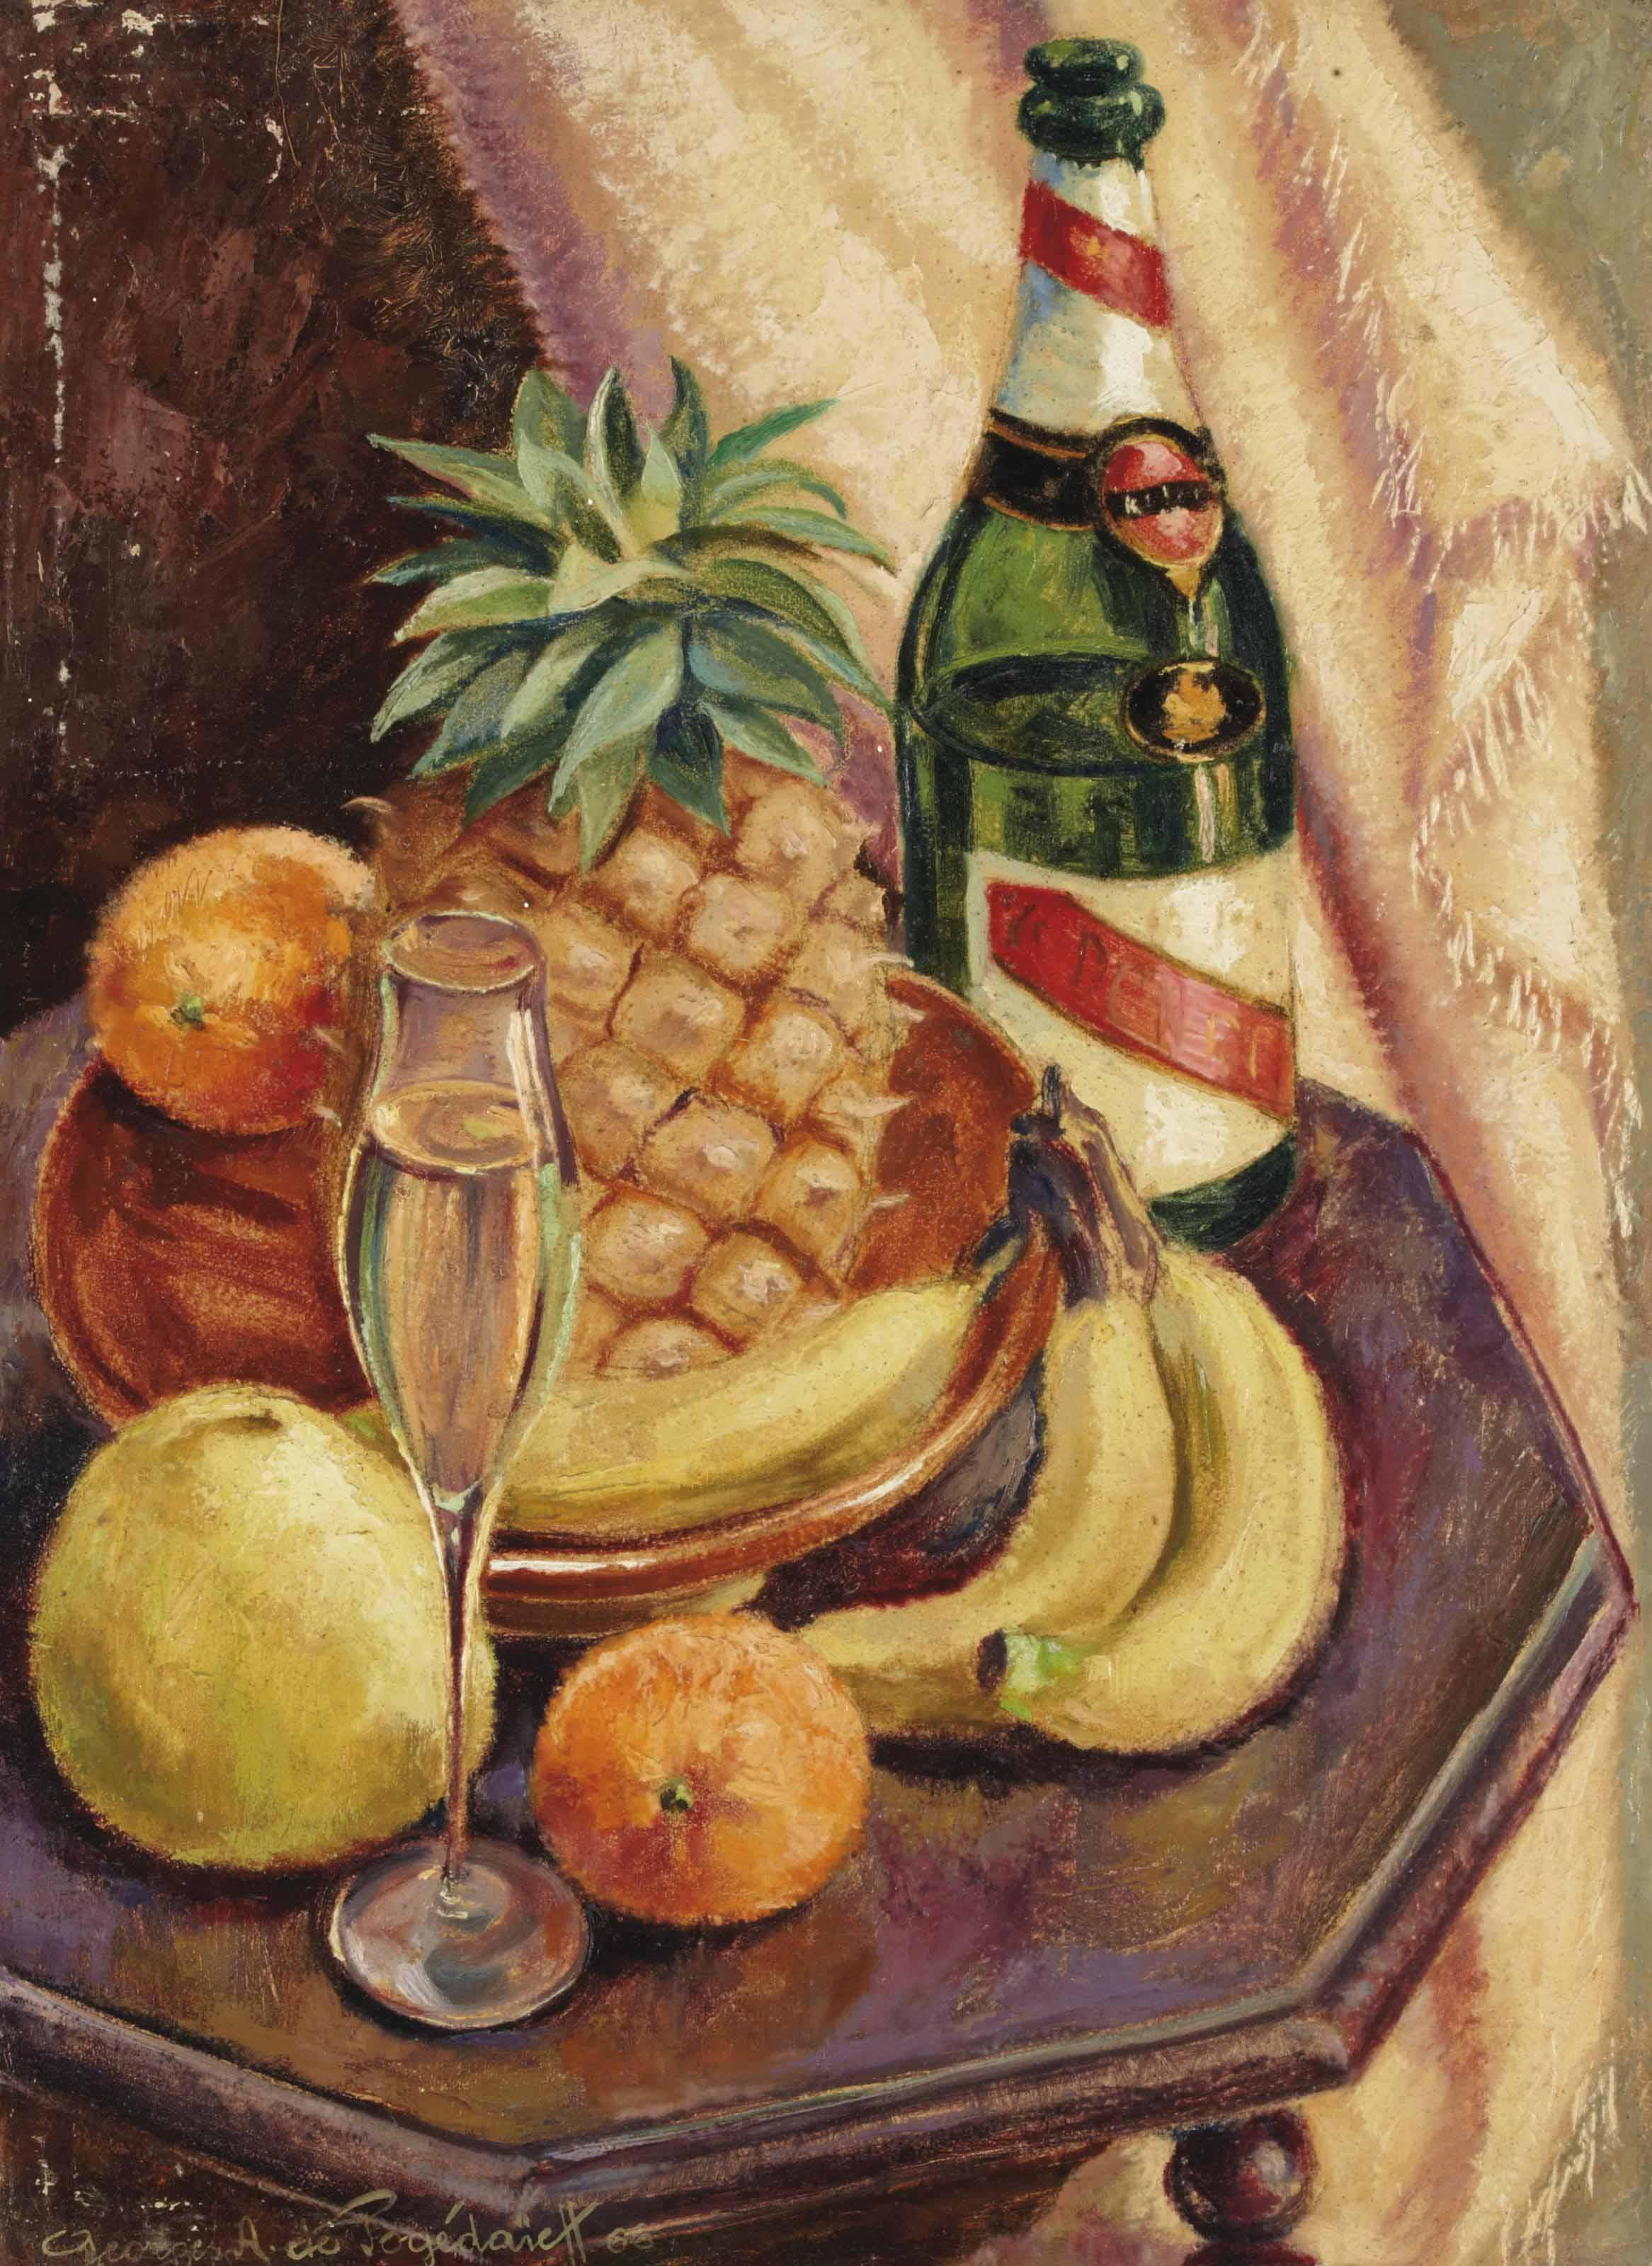 Mumm à l'ananas